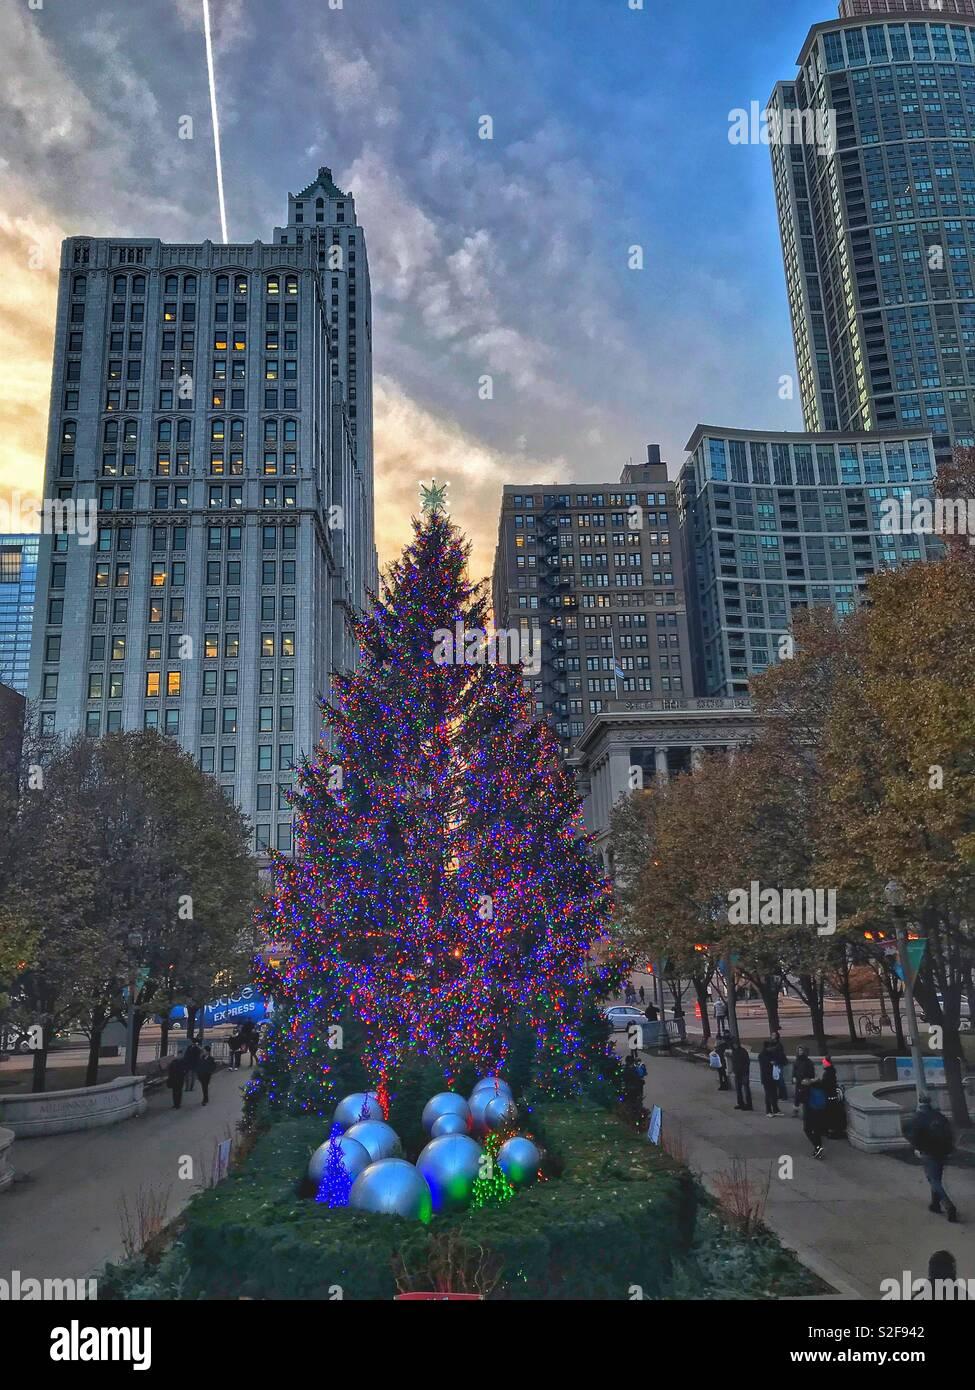 Christmas Tree Downtown Chicago.Christmas Tree Downtown Chicago Stock Photo 311352386 Alamy